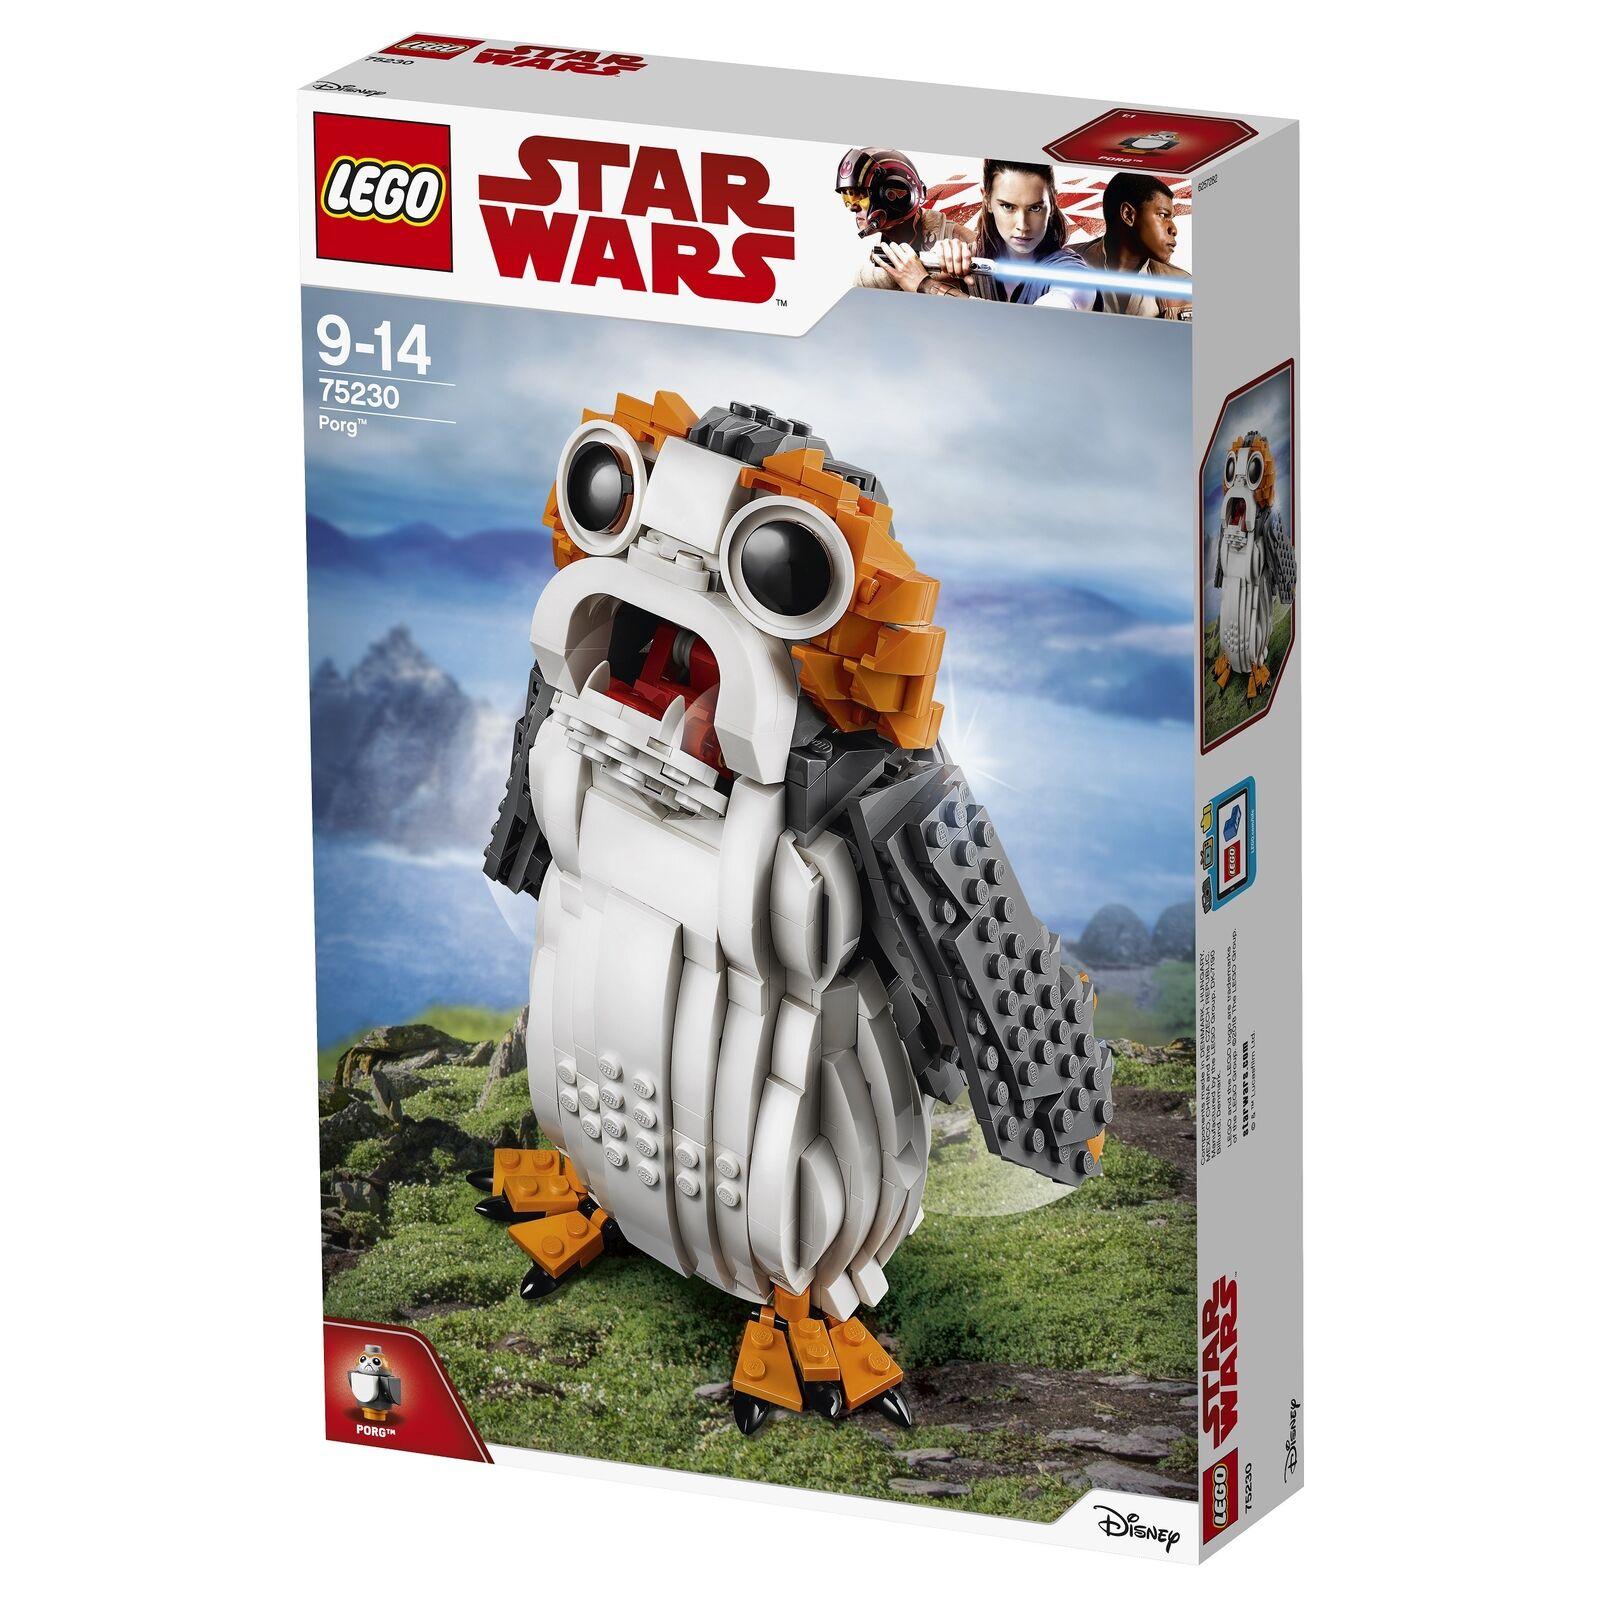 Lego Star Wars 75230 Porg NOUVEAU & NEUF dans sa boîte